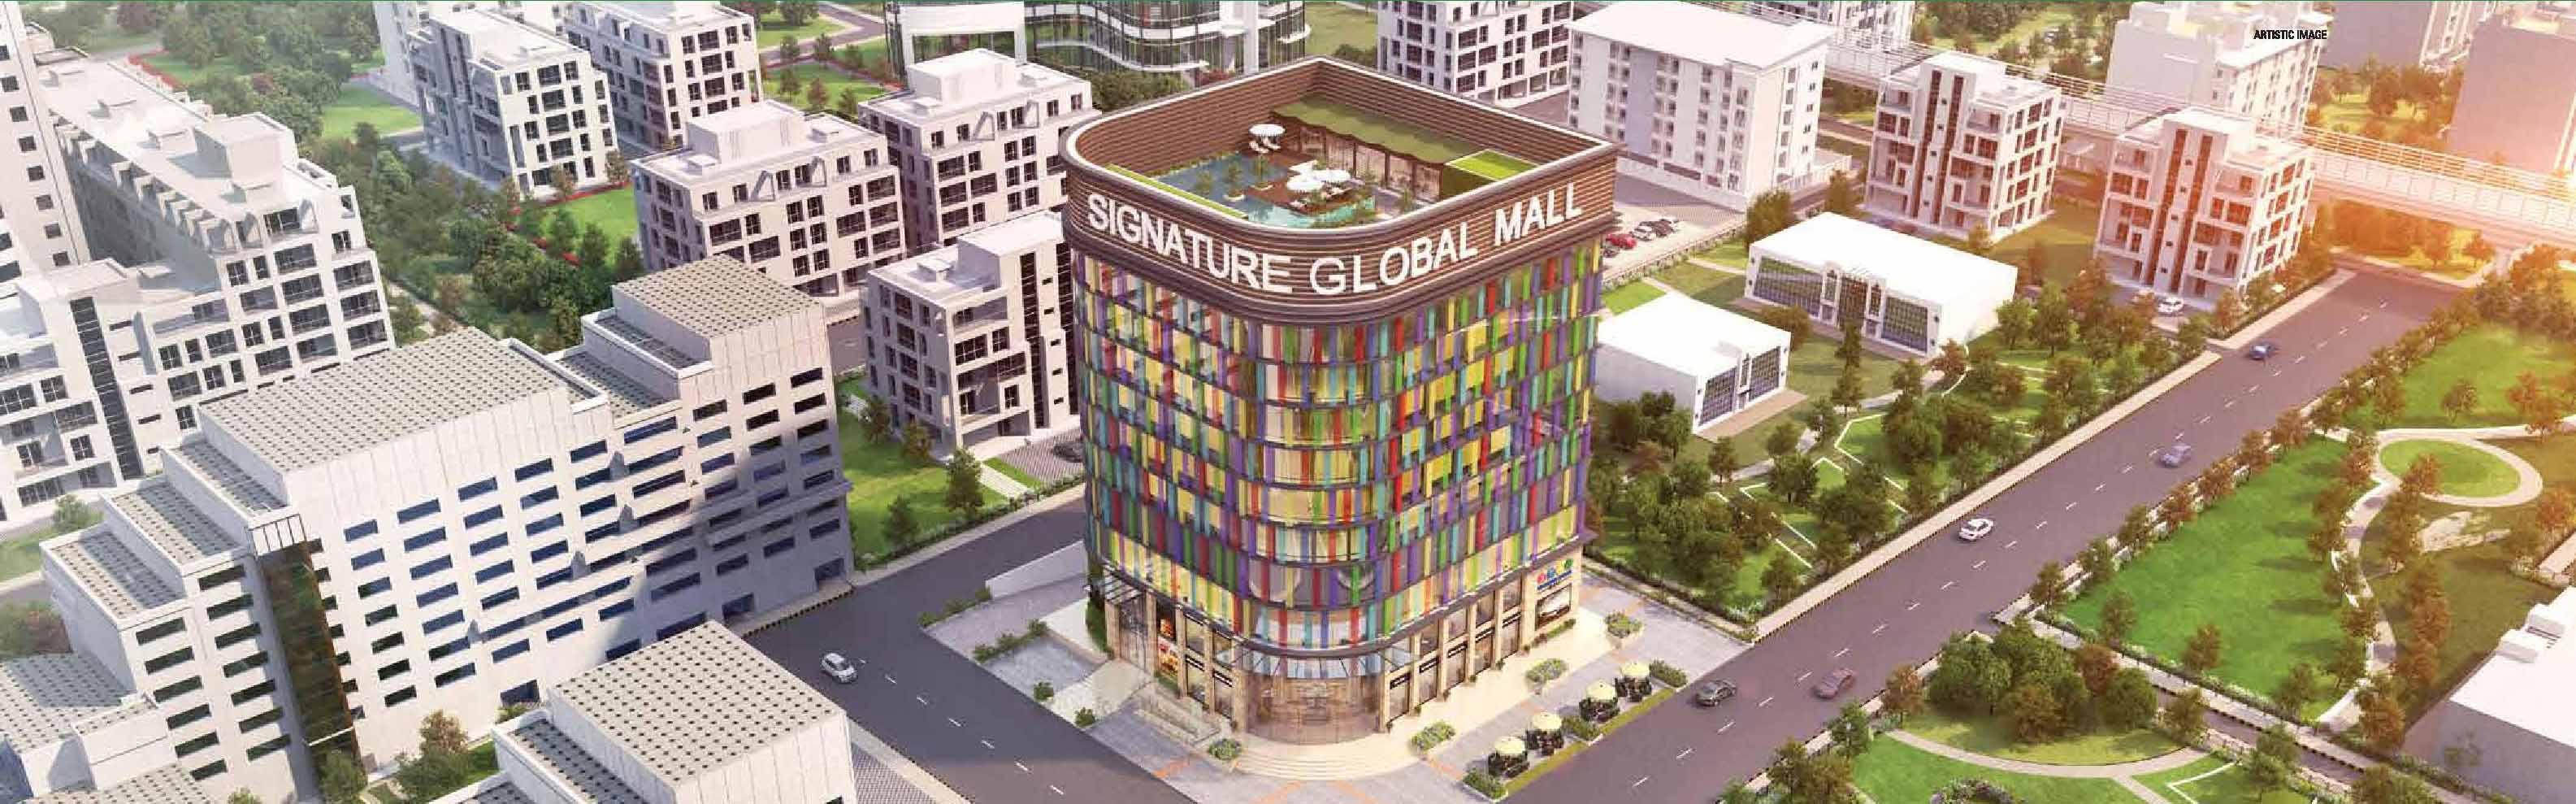 signature global-mall